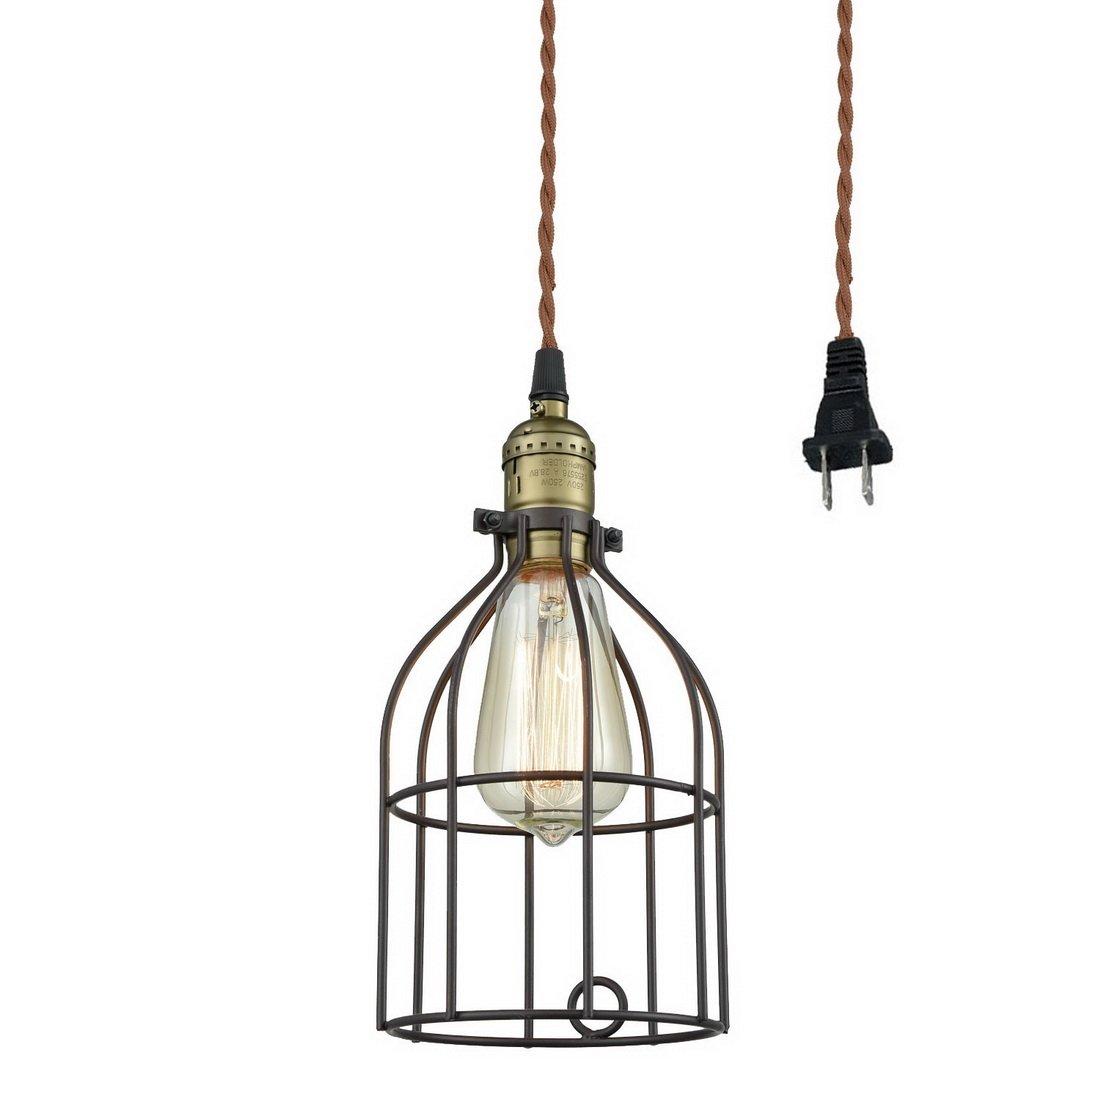 truelite industrial vintage style mini plug in pendant light metal bird cage 735980992327 ebay. Black Bedroom Furniture Sets. Home Design Ideas